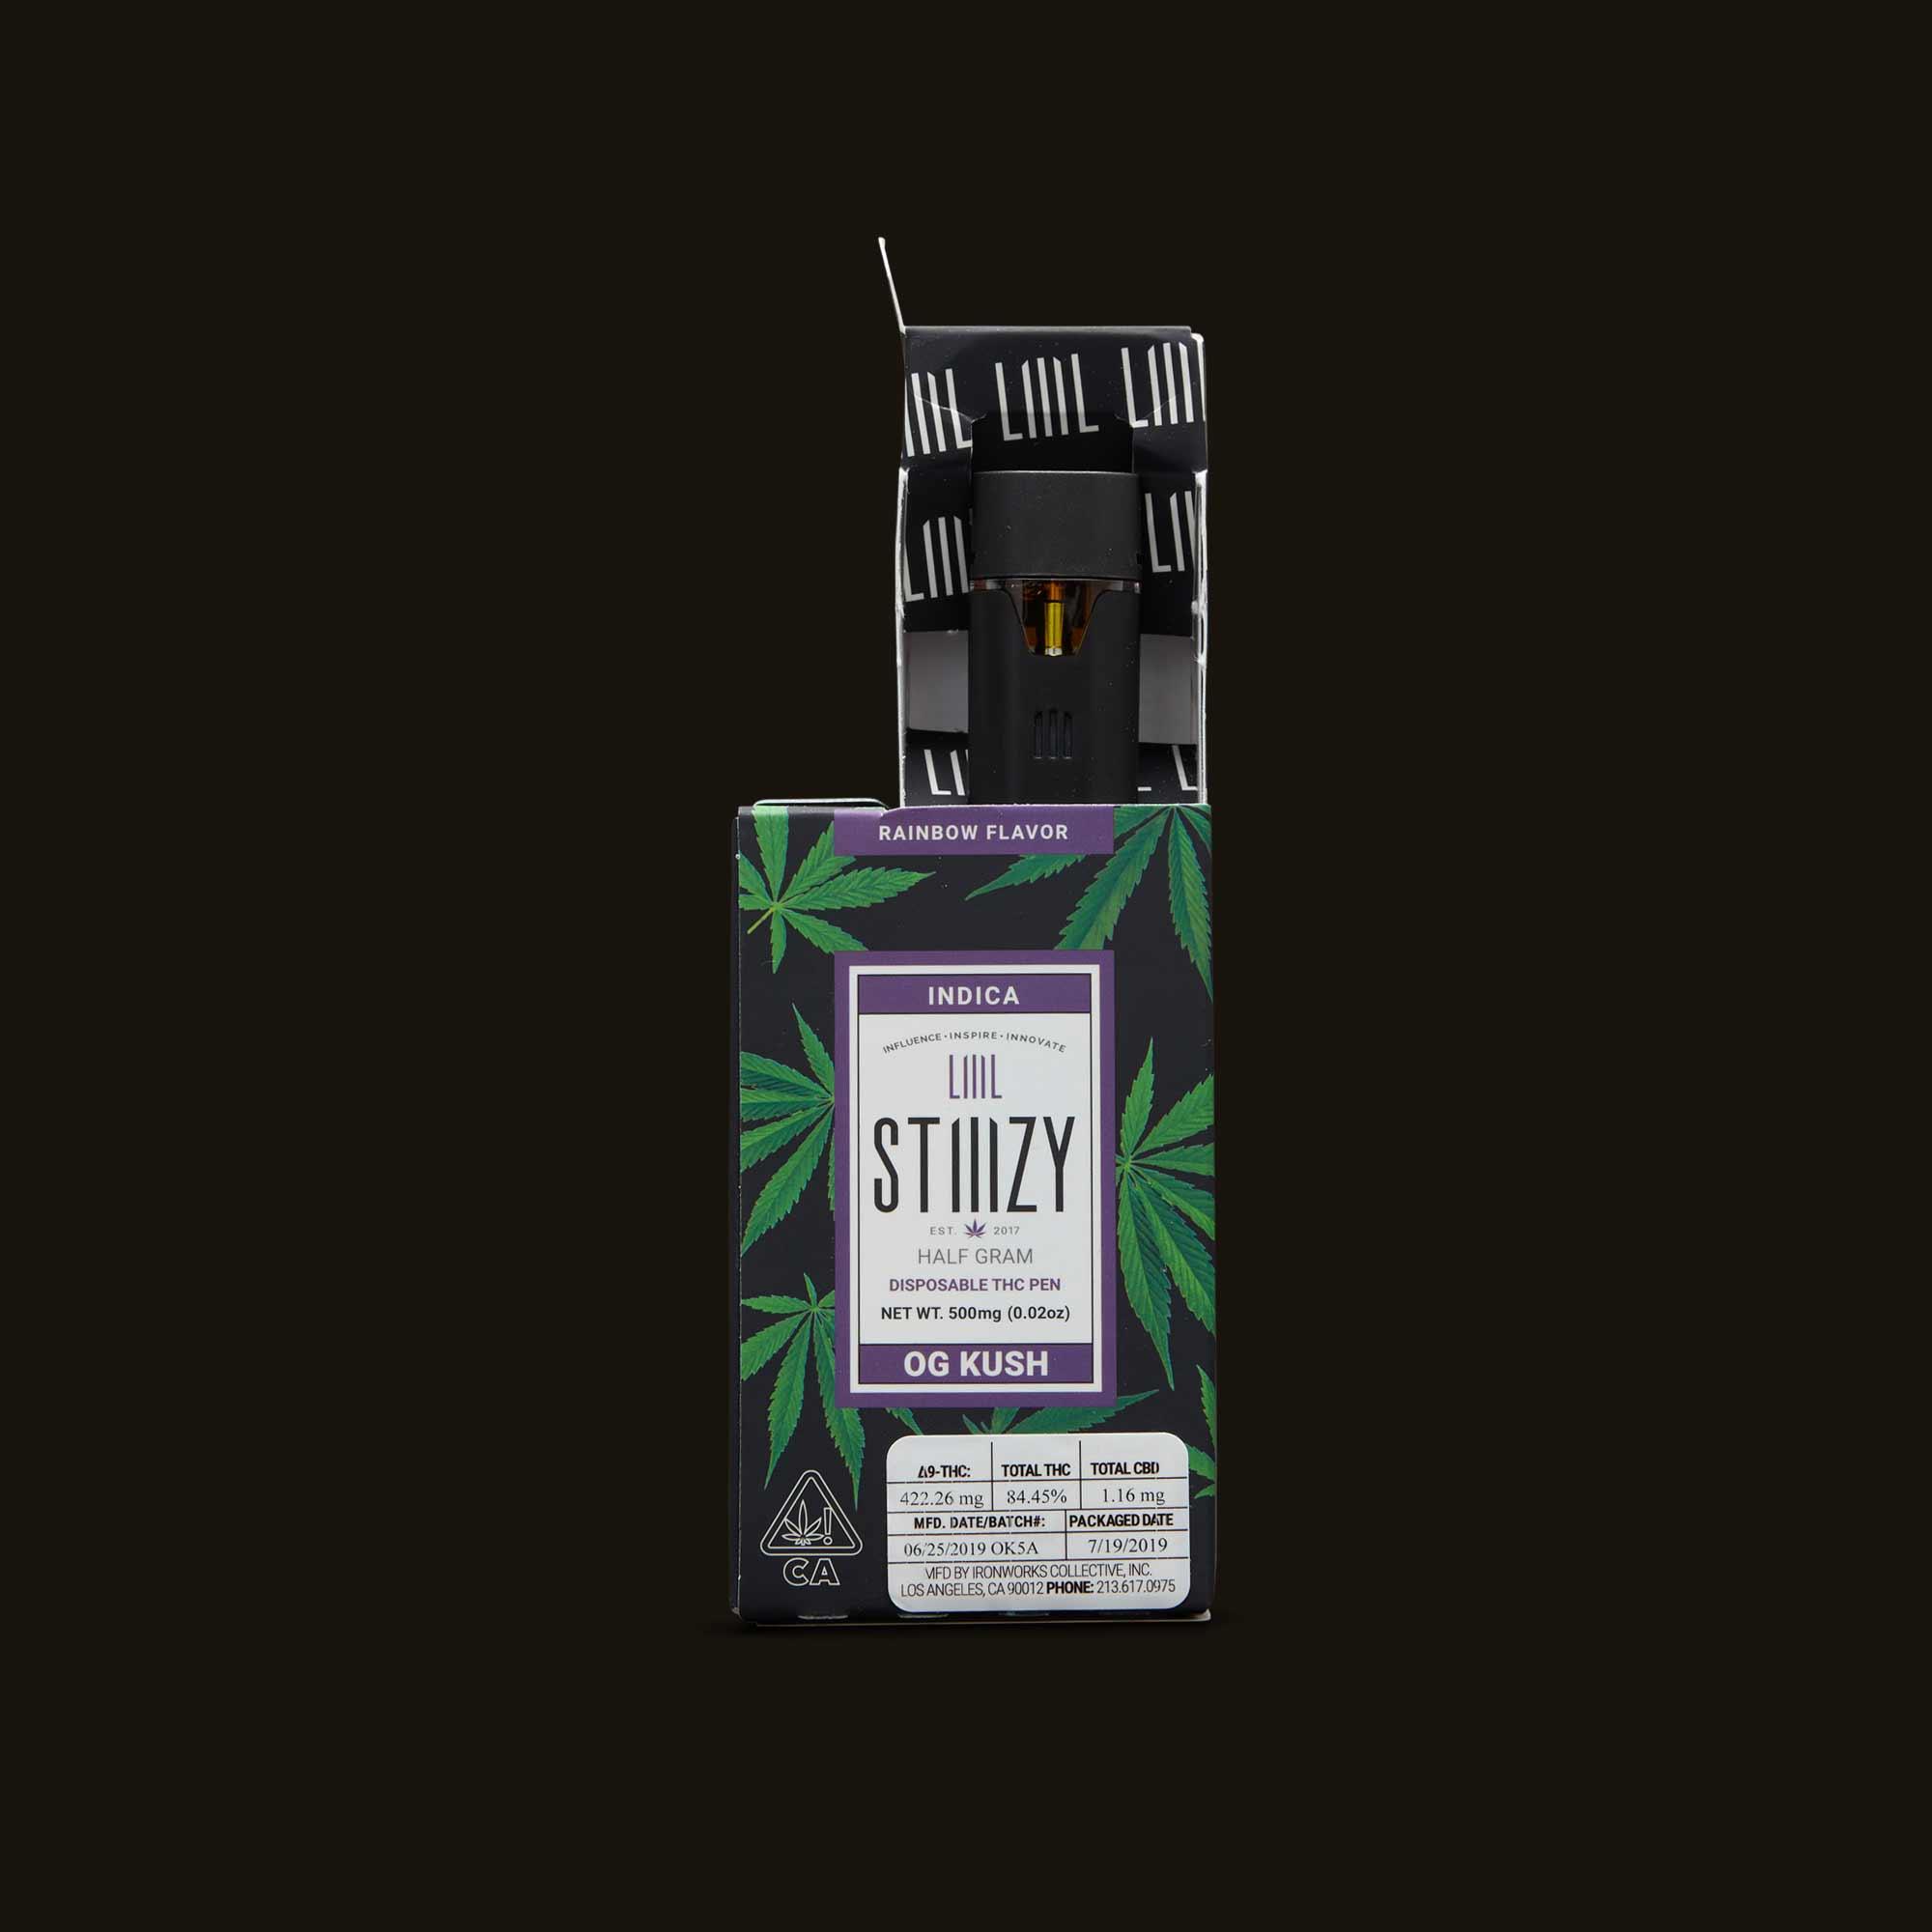 Stiiizy OG Kush Liiil Vape Pen packaging with label showing THC percentage